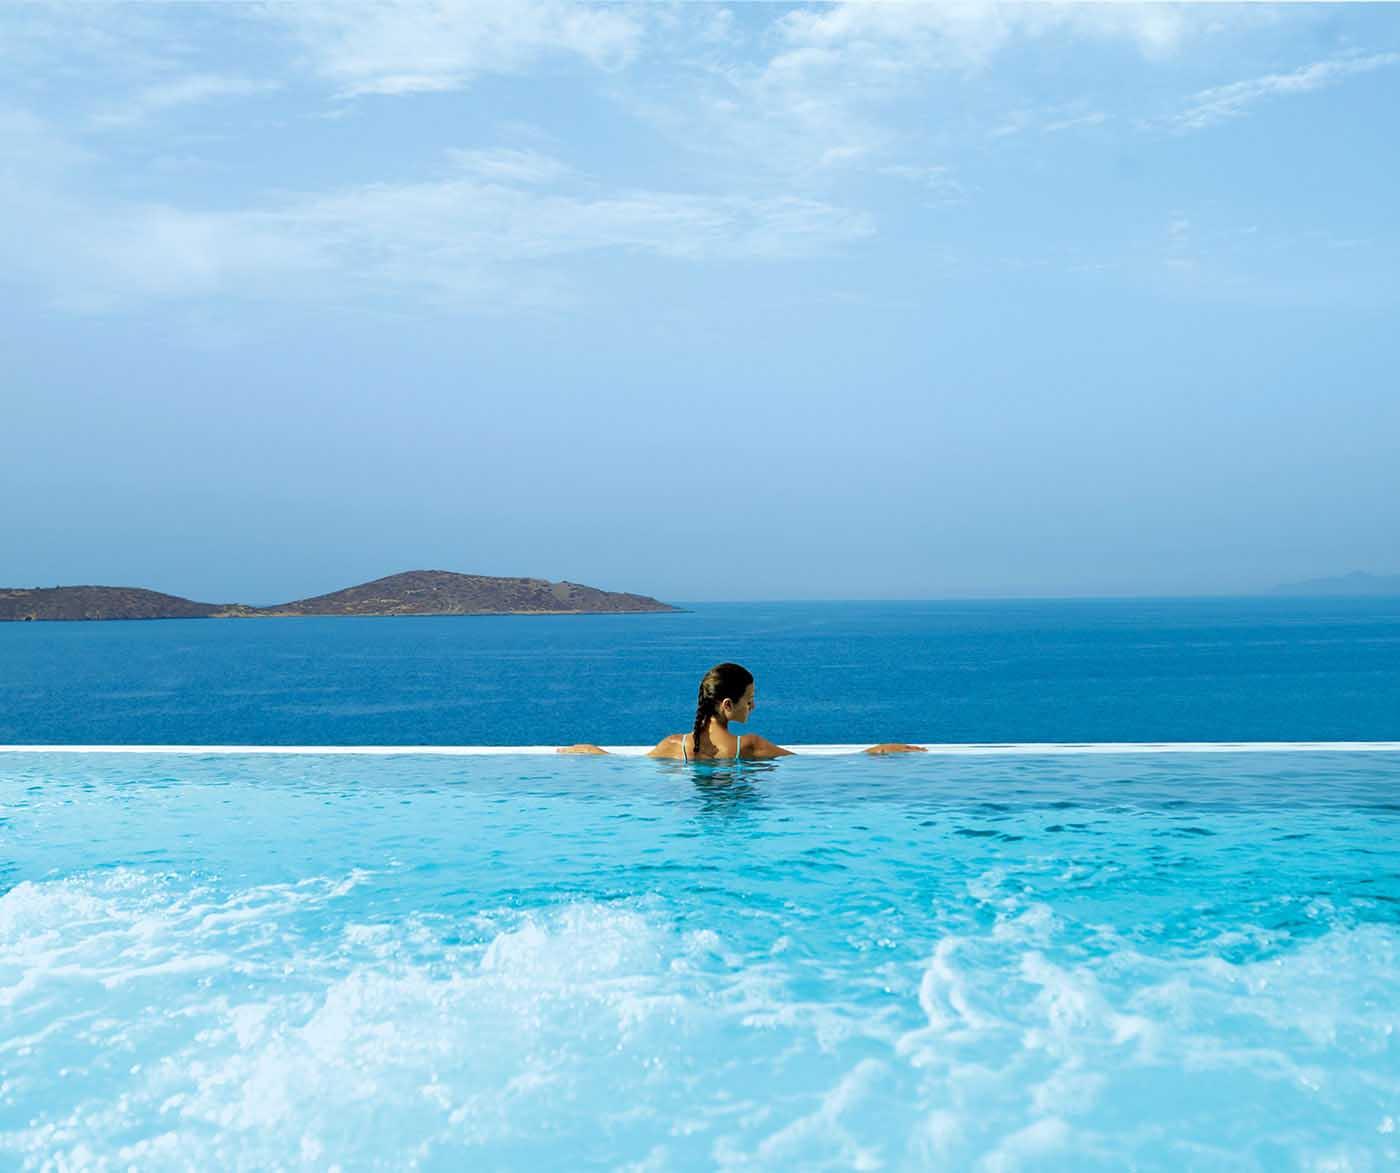 Fira - Firostefani hotels & resorts, 50% discount for early bookings, Fira - Firostefani, Santorini, Cyclades Islands, Greece